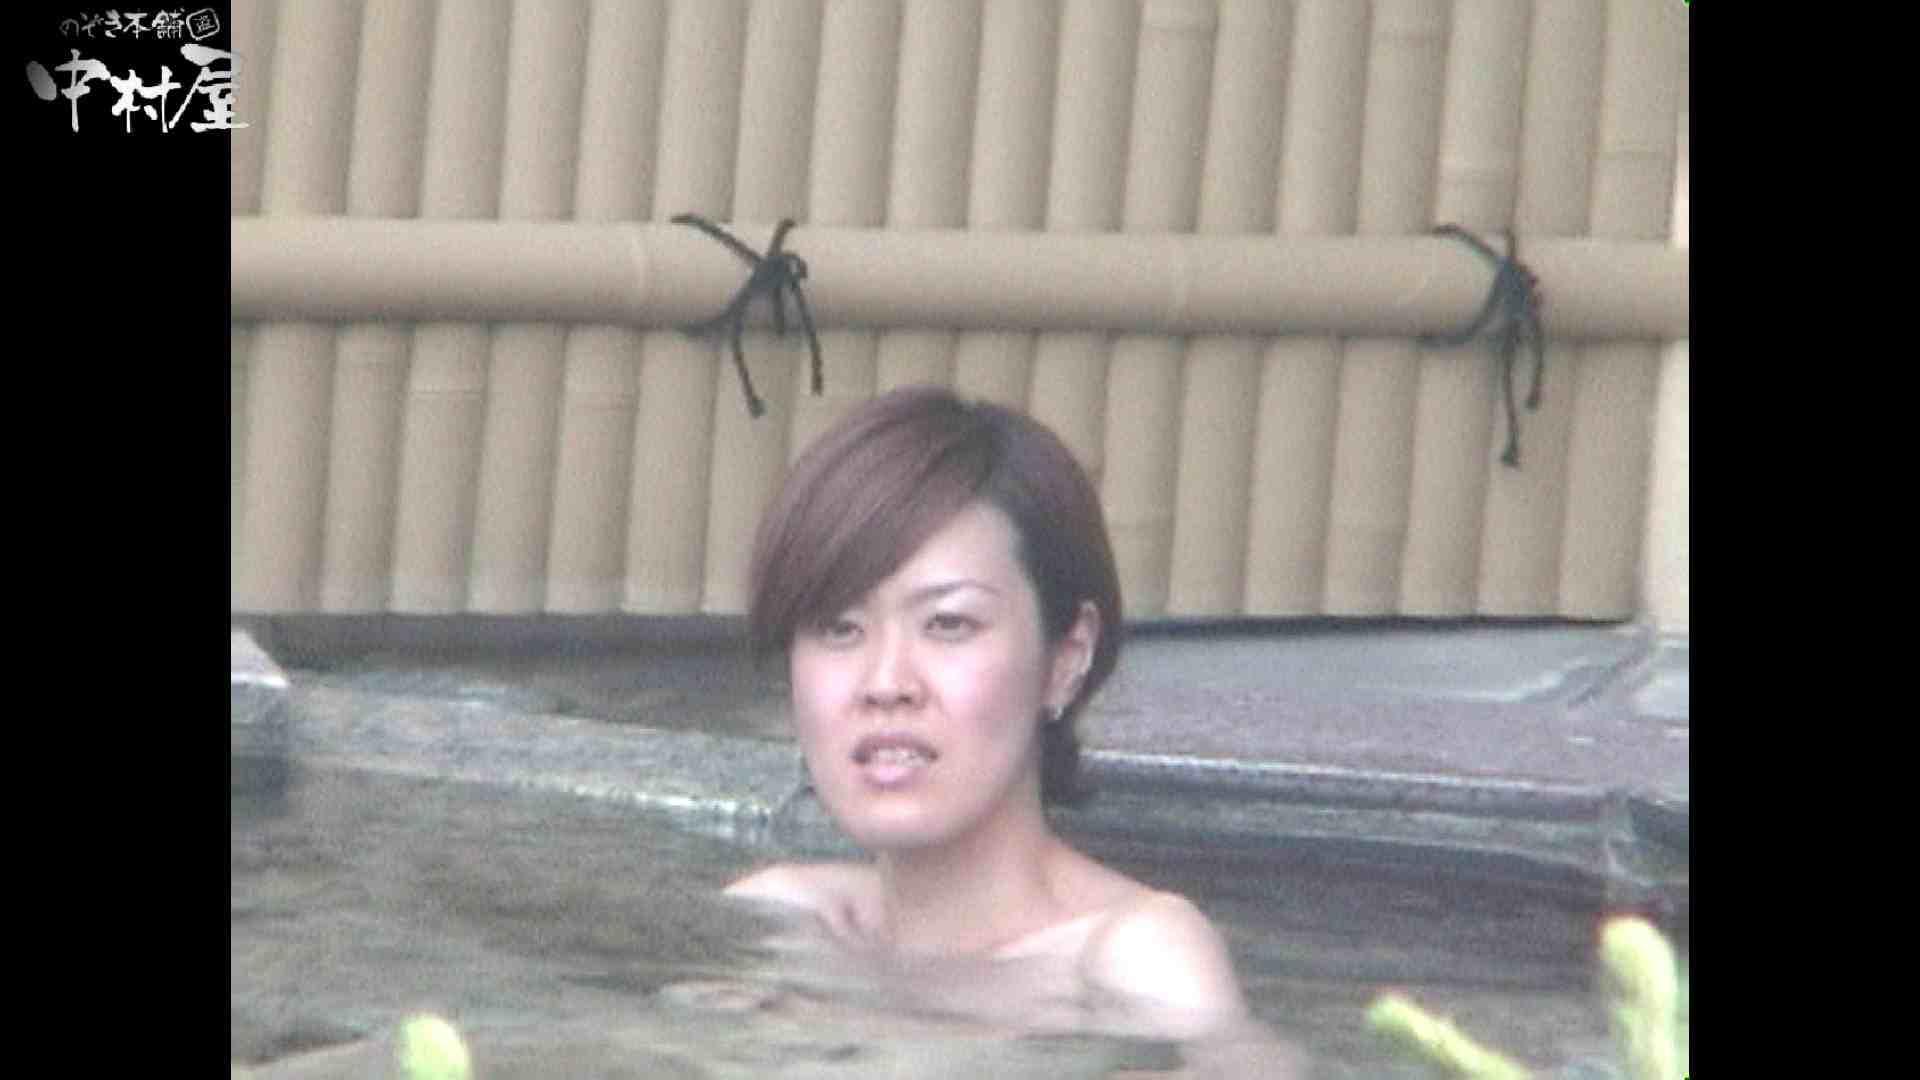 Aquaな露天風呂Vol.961 露天風呂 | OLのエロ生活  104連発 76